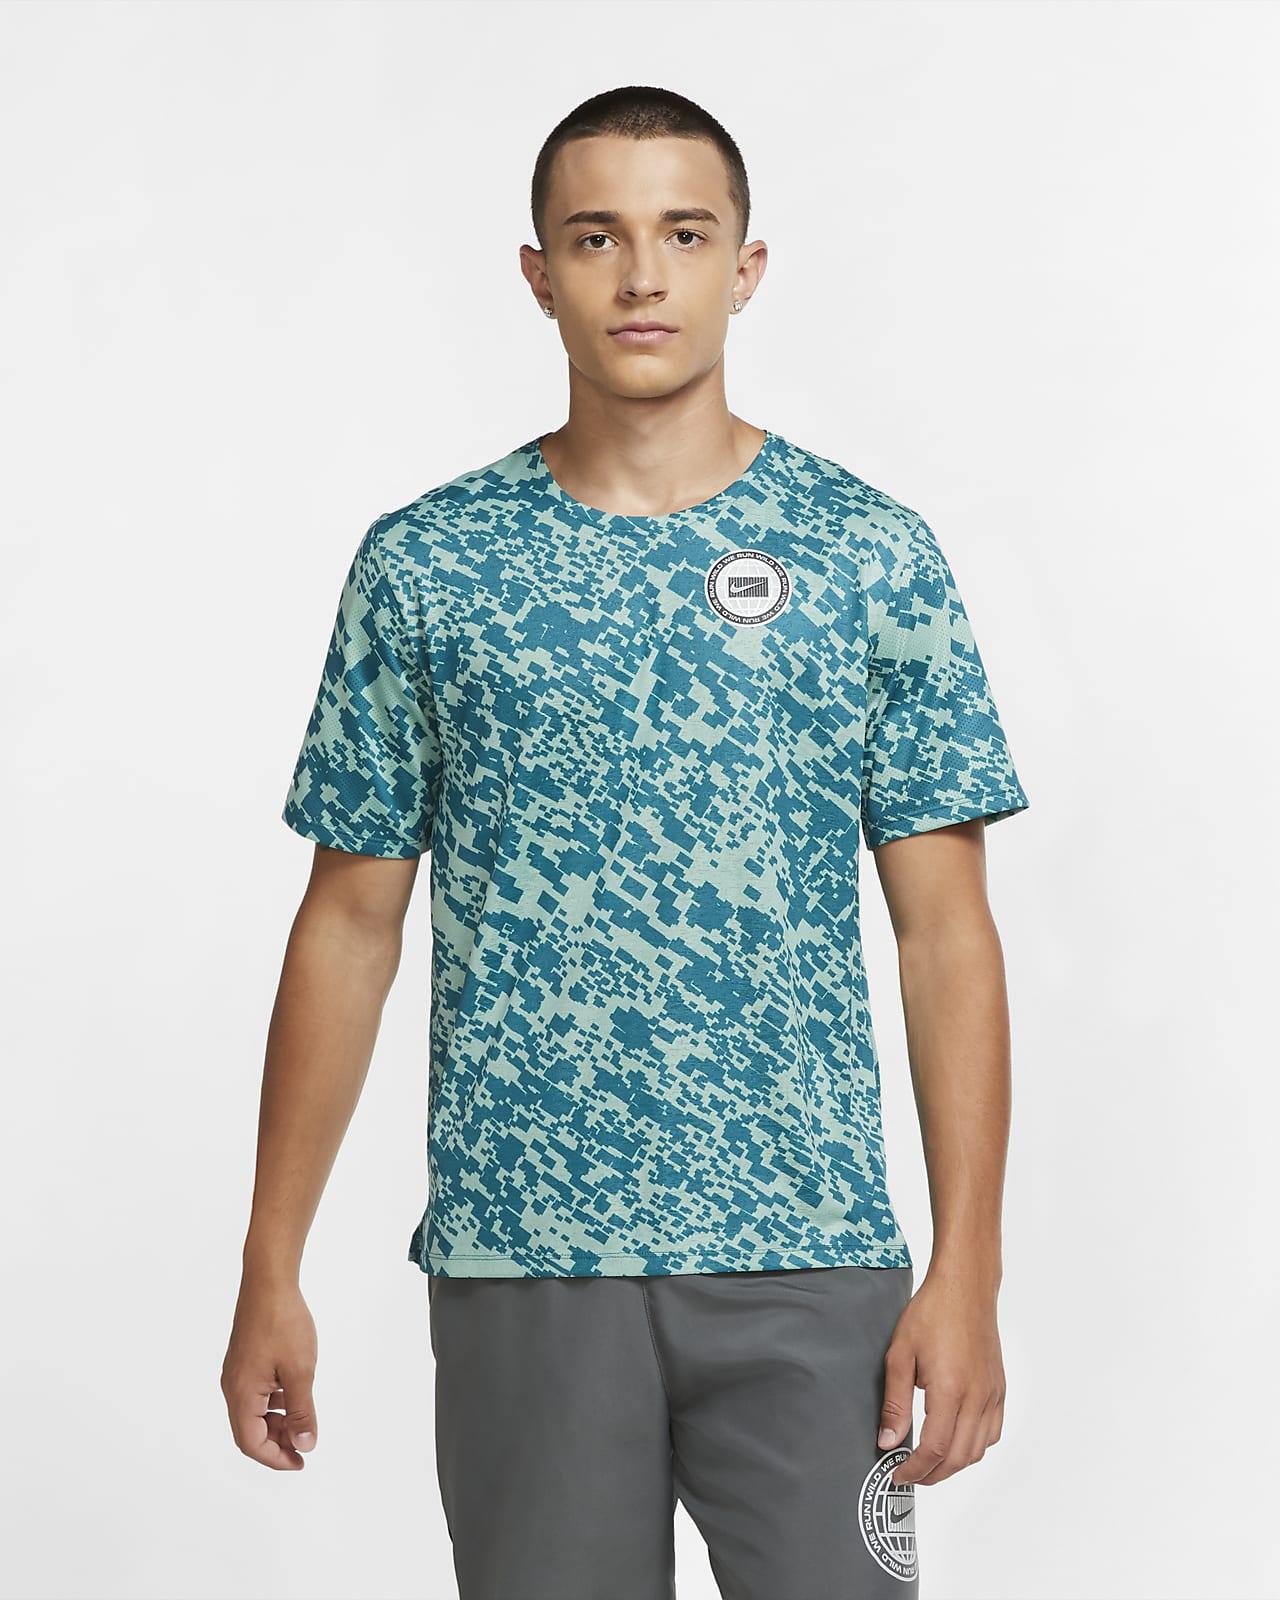 Nike Dri-FIT Miler Wild Run Hardlooptop met print voor heren